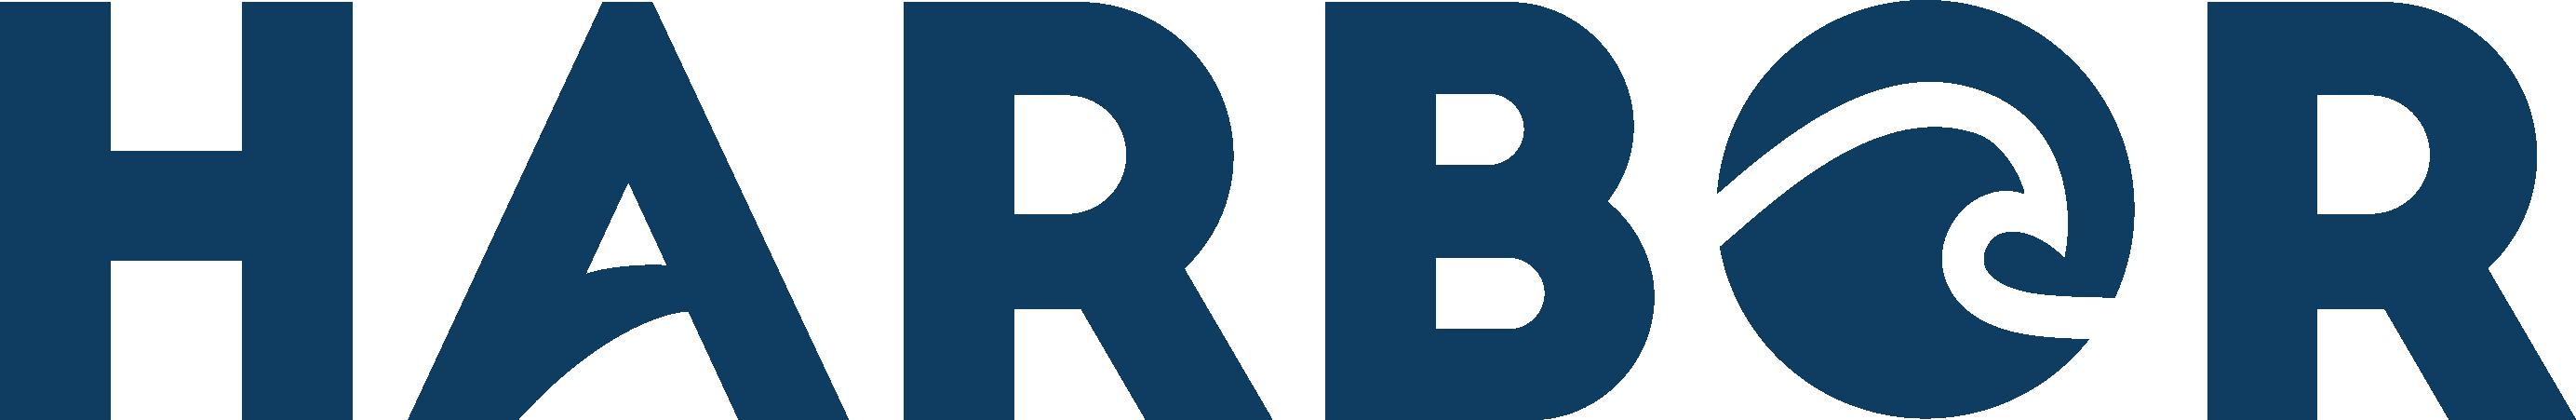 harbor-logo_rd5